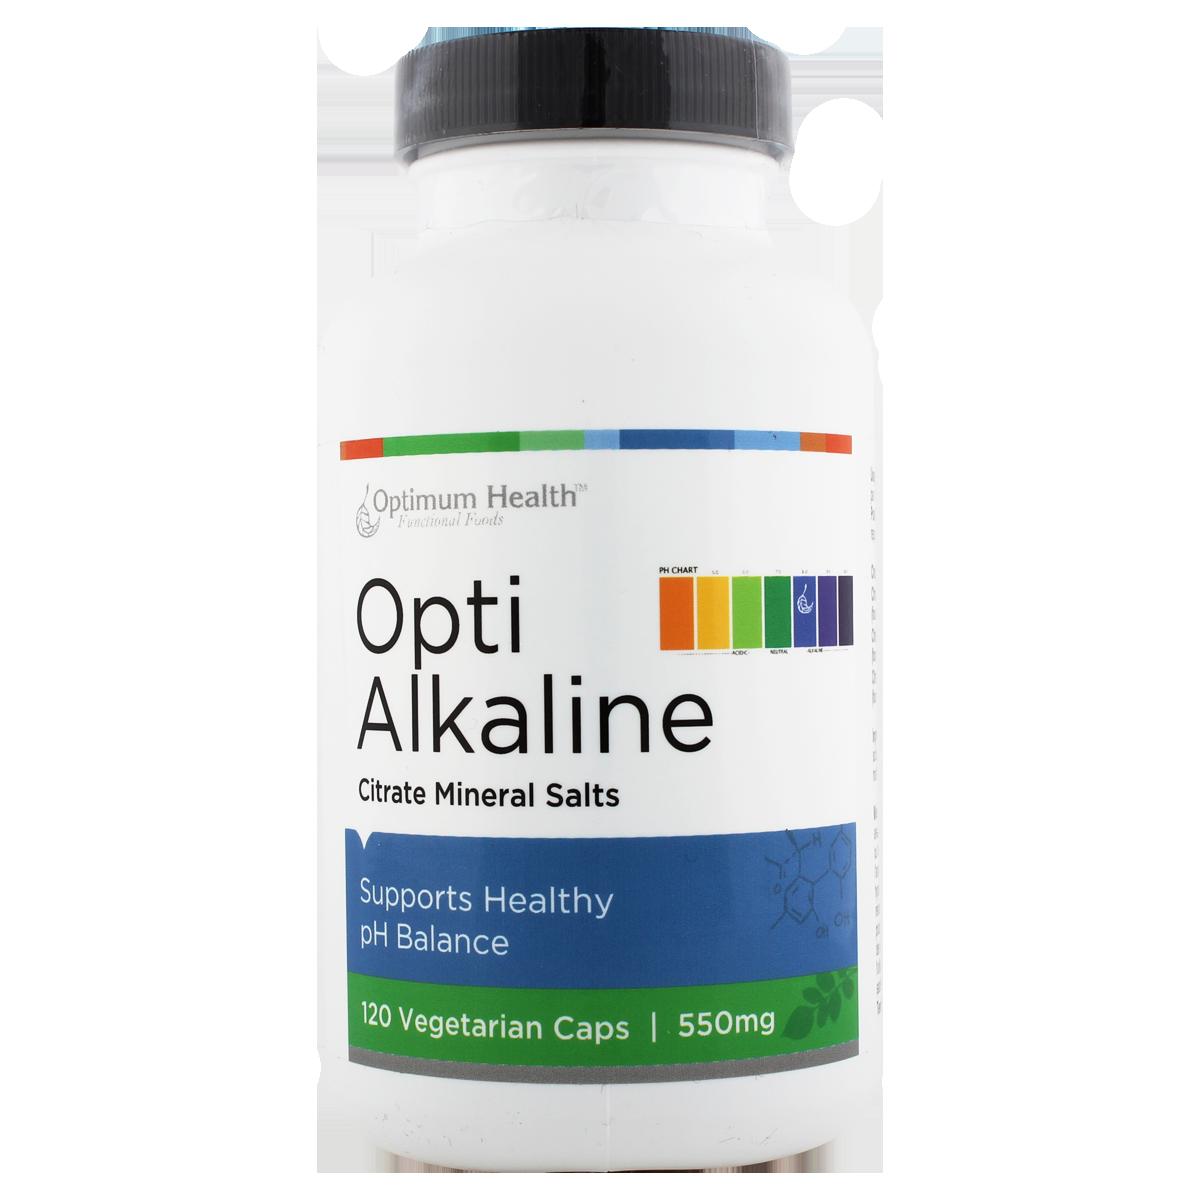 OptiAlkaline2